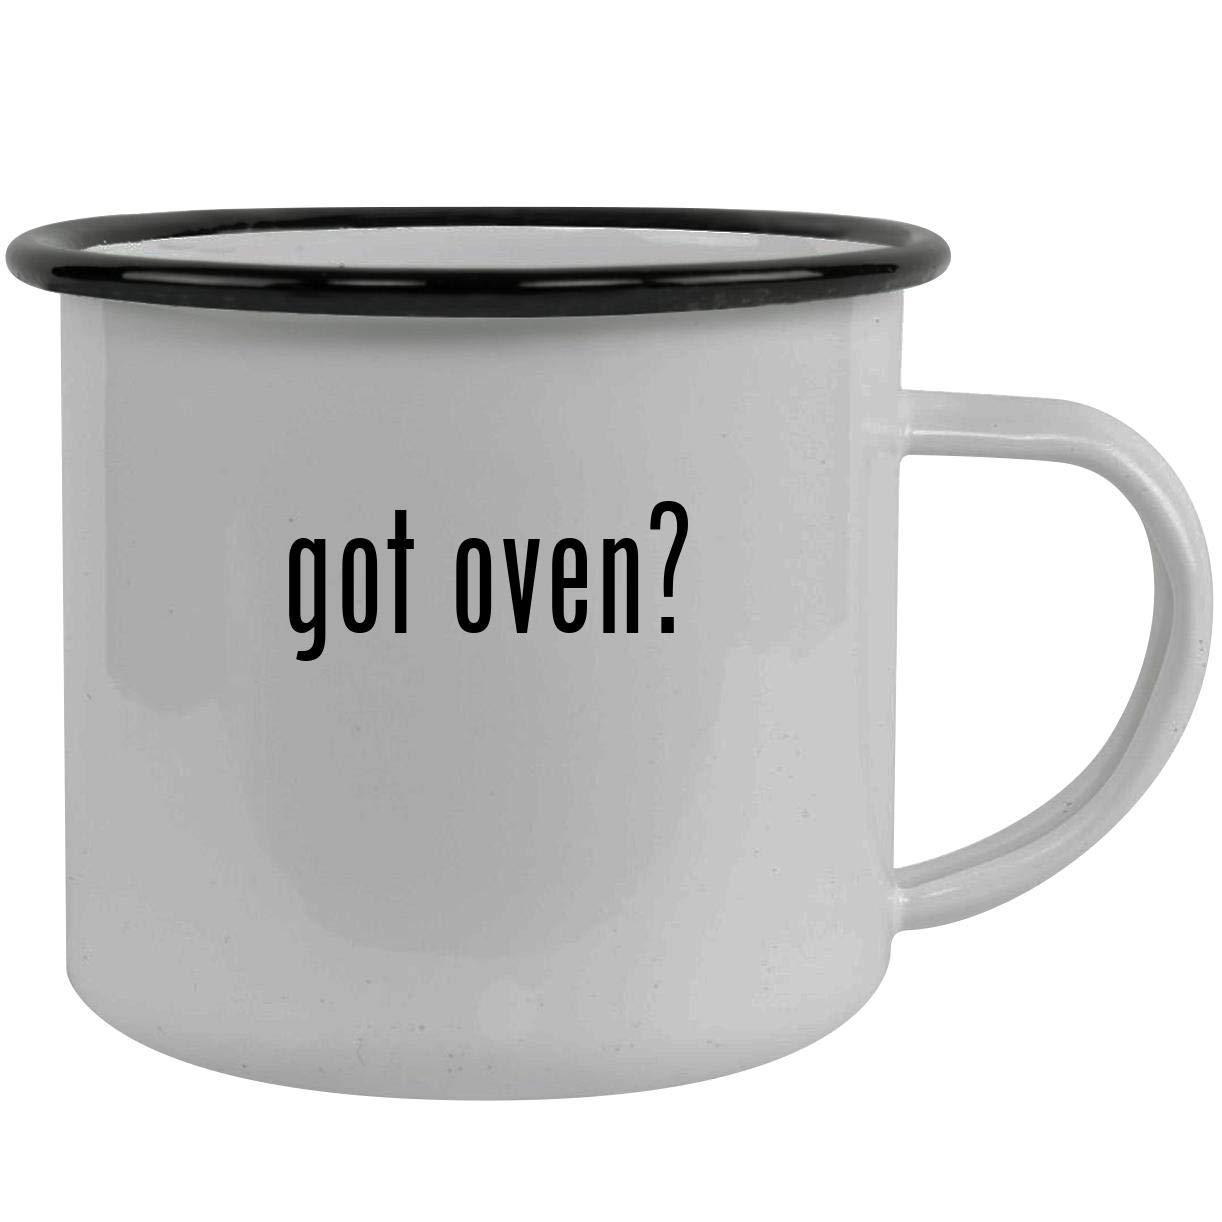 got oven? - Stainless Steel 12oz Camping Mug, Black